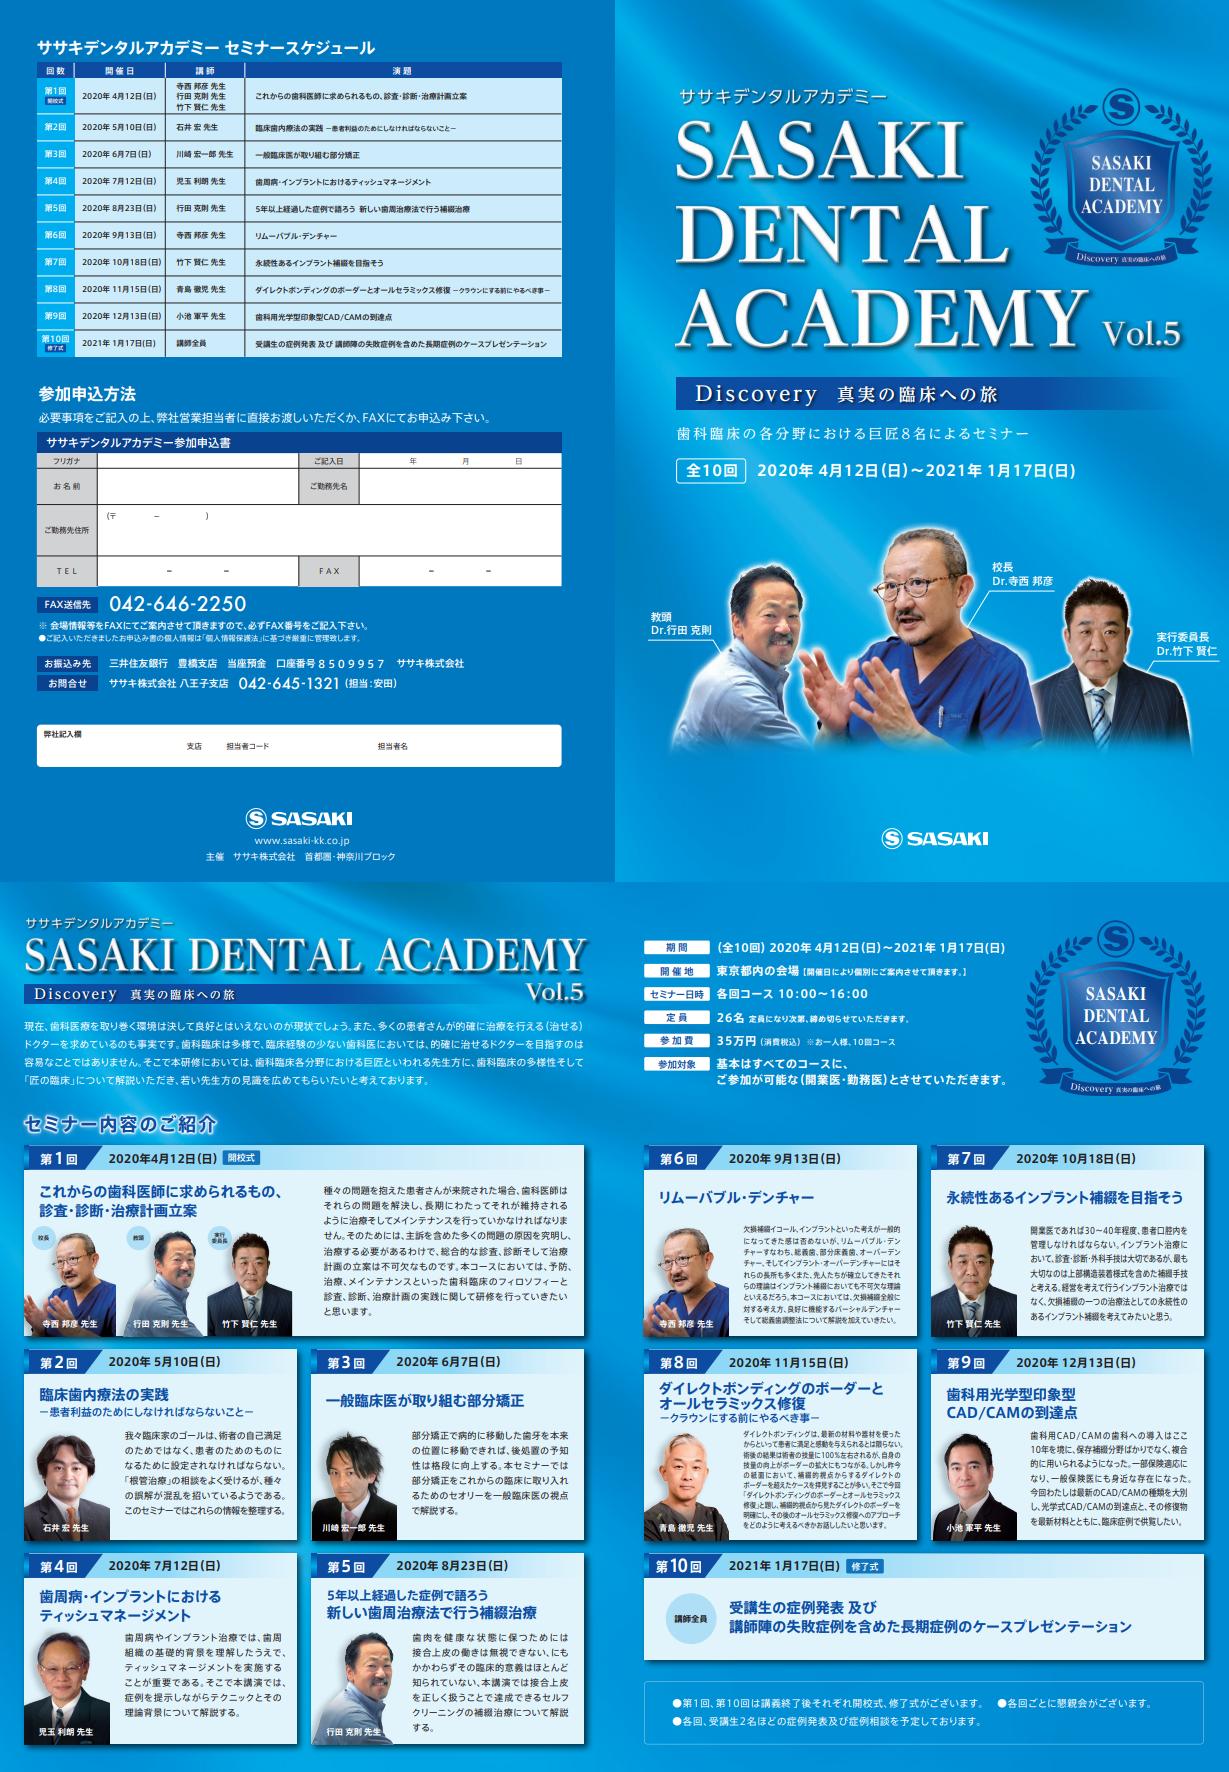 SASAKI DENTAL ACADEMY vol.5 ~歯科臨床の各分野における巨匠8 名によるセミナー~